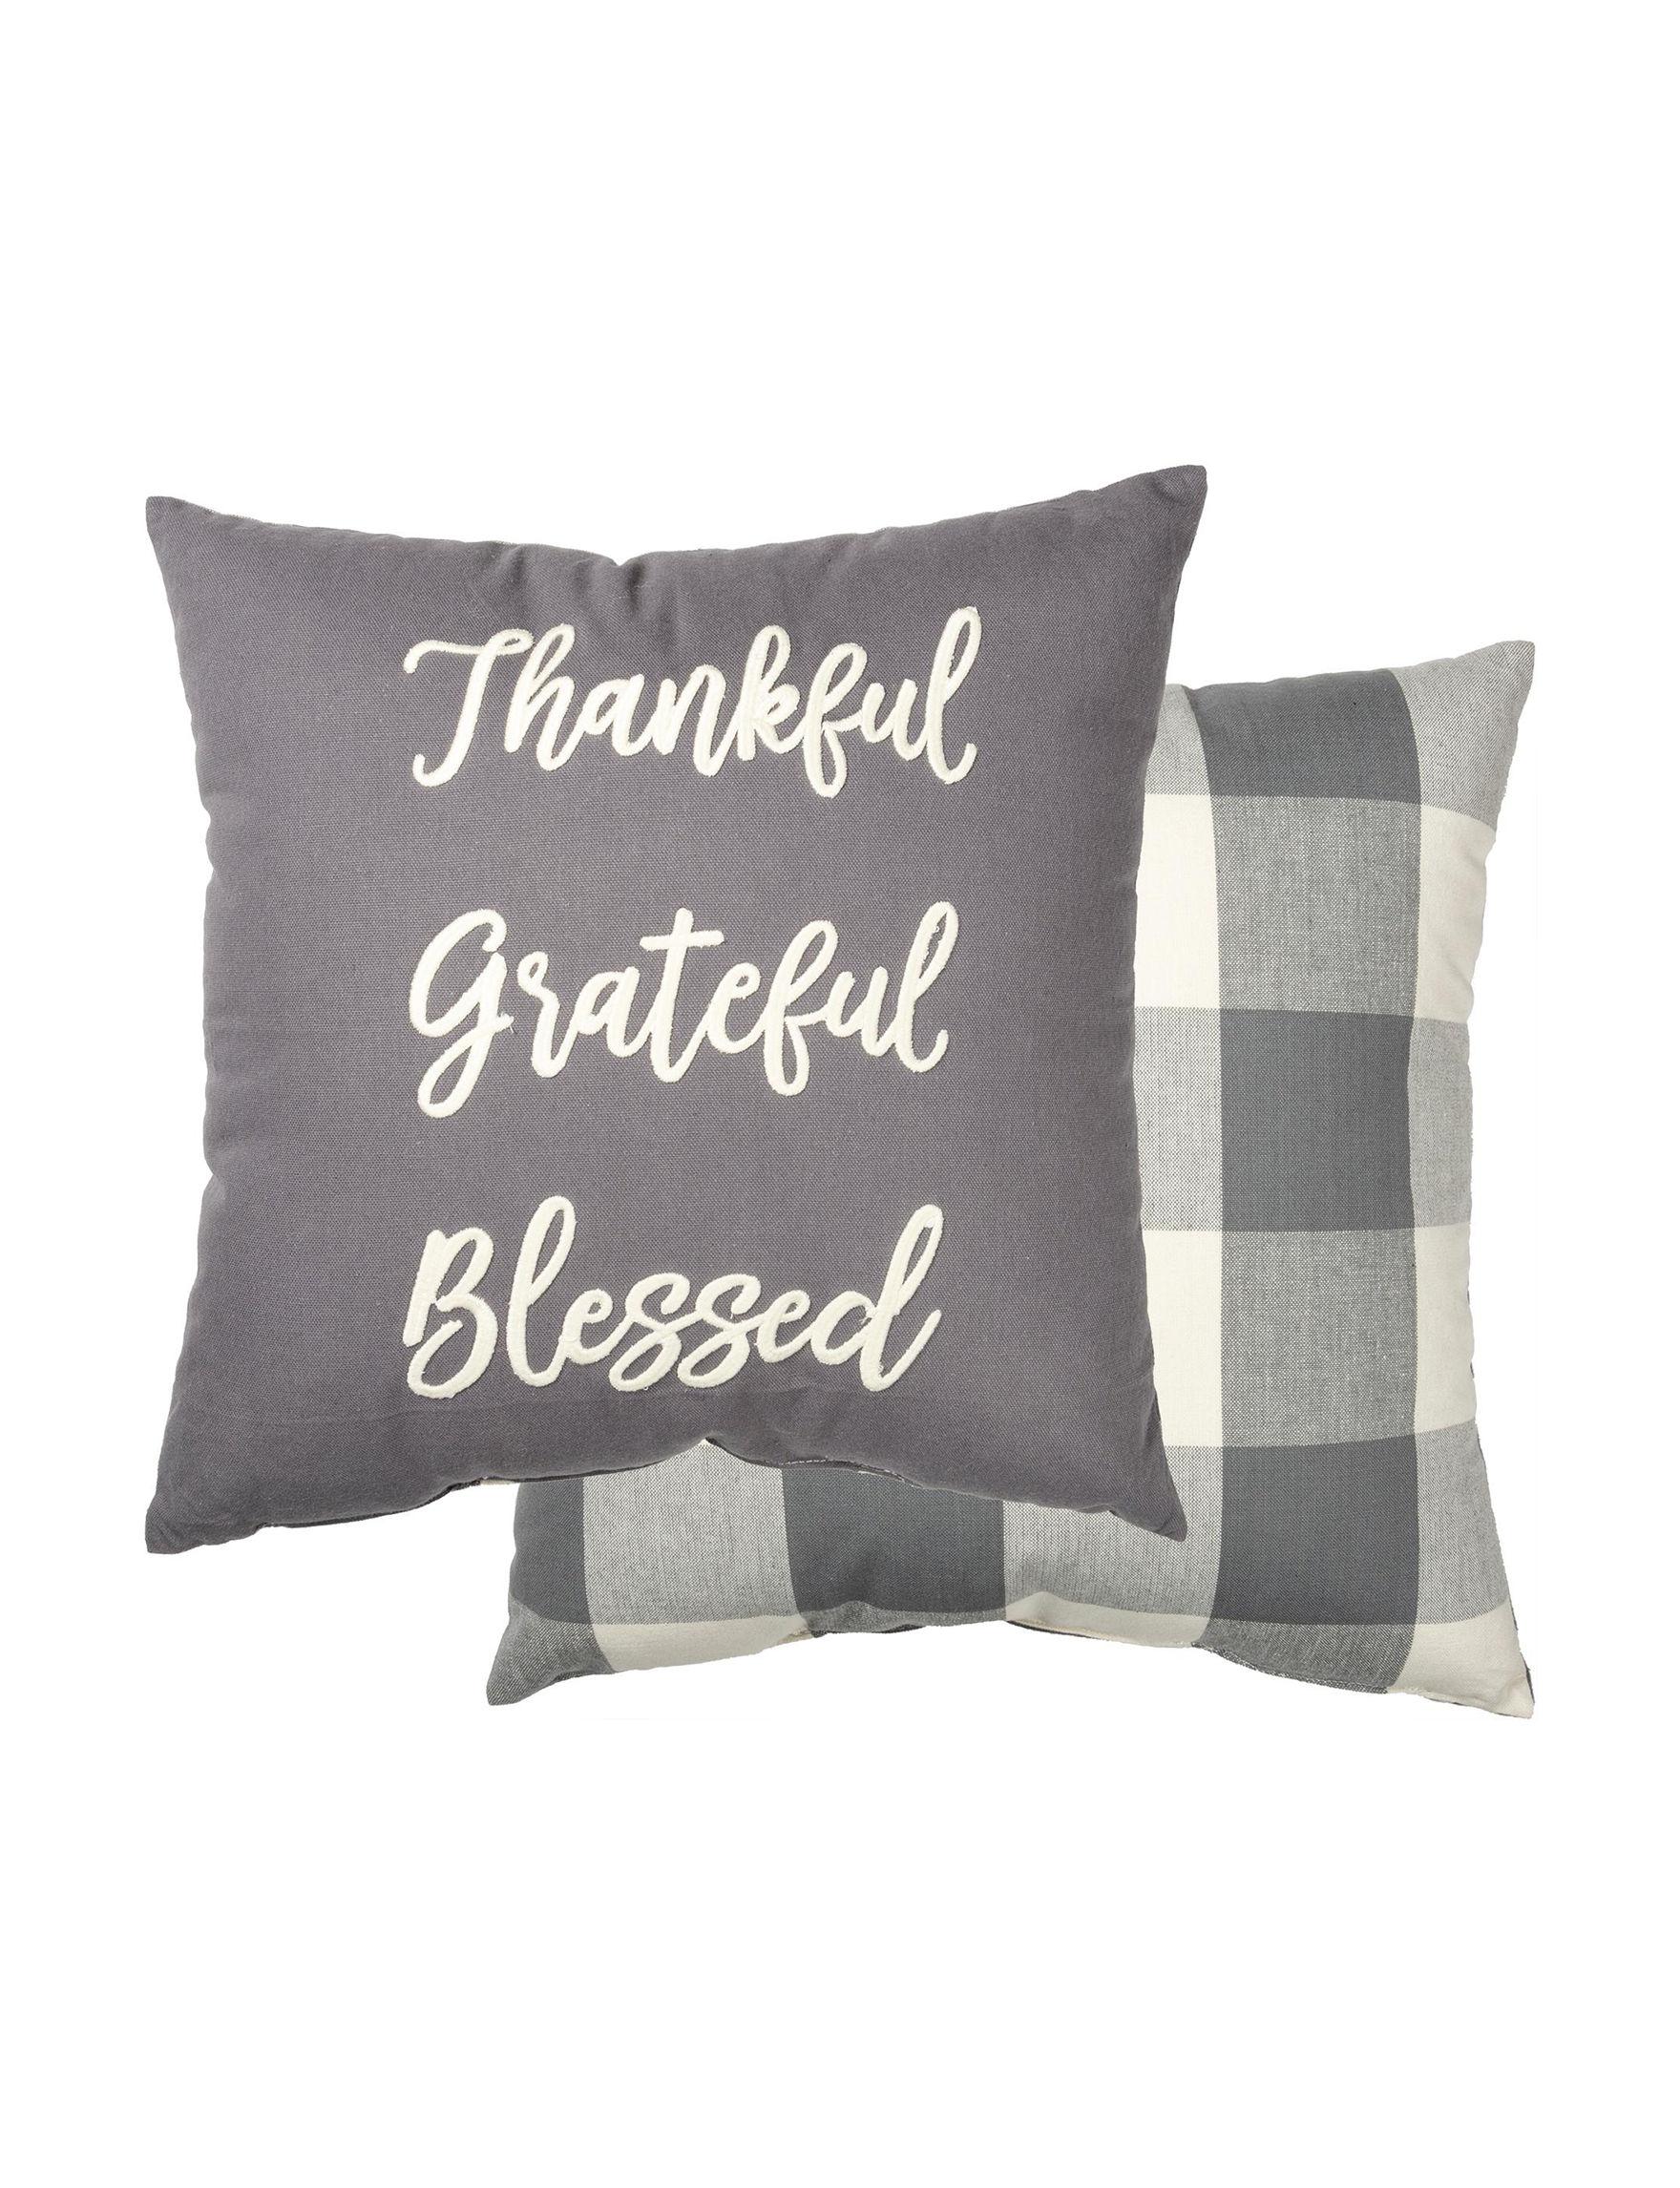 Primitives by Kathy Grey Decorative Pillows